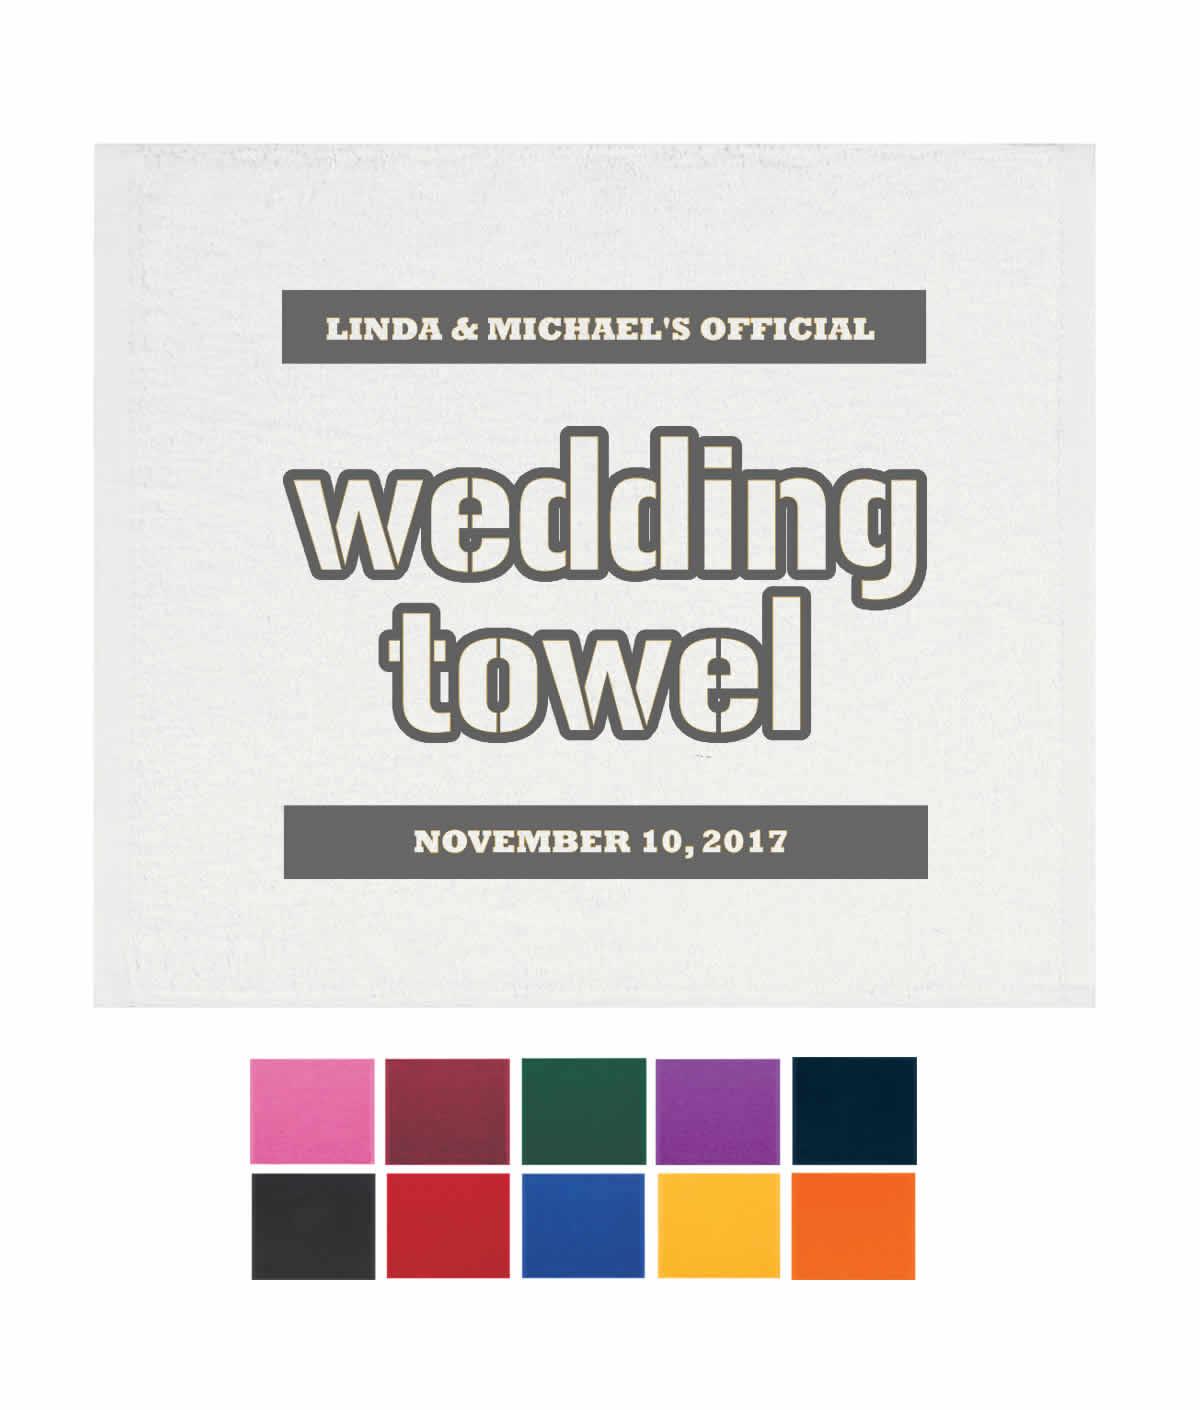 Wedding Rally Towels, Wedding Terrible Towel, The Wedding Towel ...